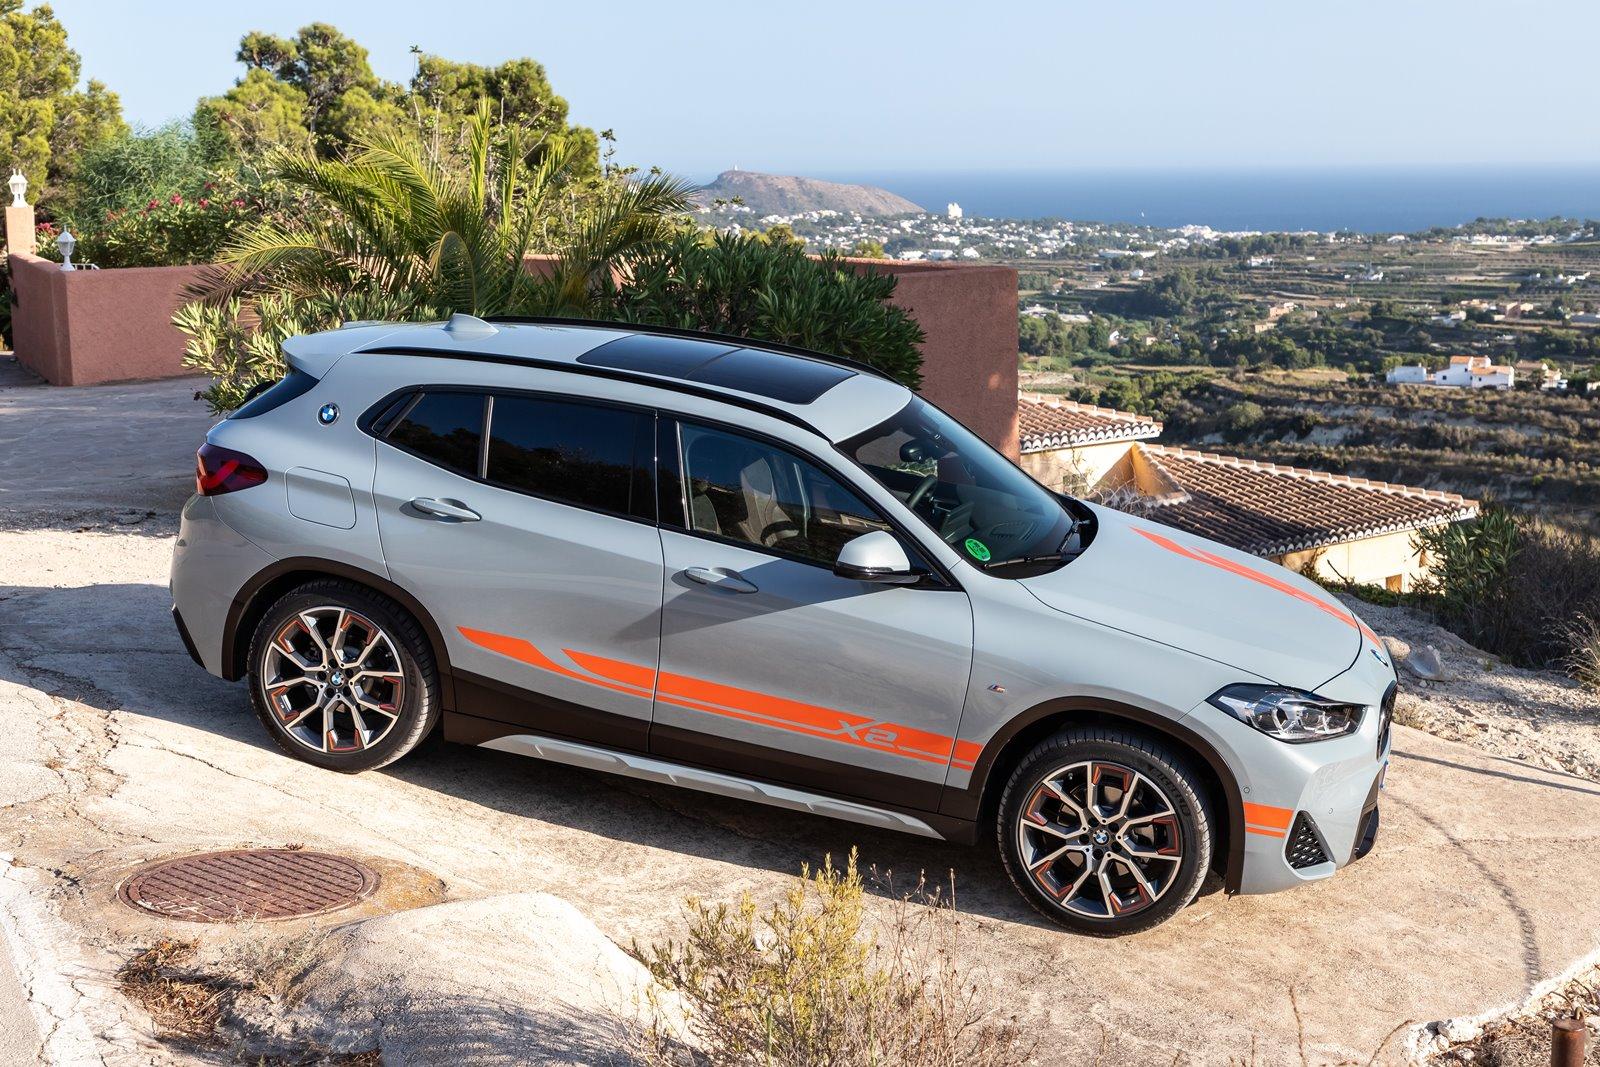 Nos ponemos al volante del BMW X2 sDrive18d Aut. M Mesh Edition